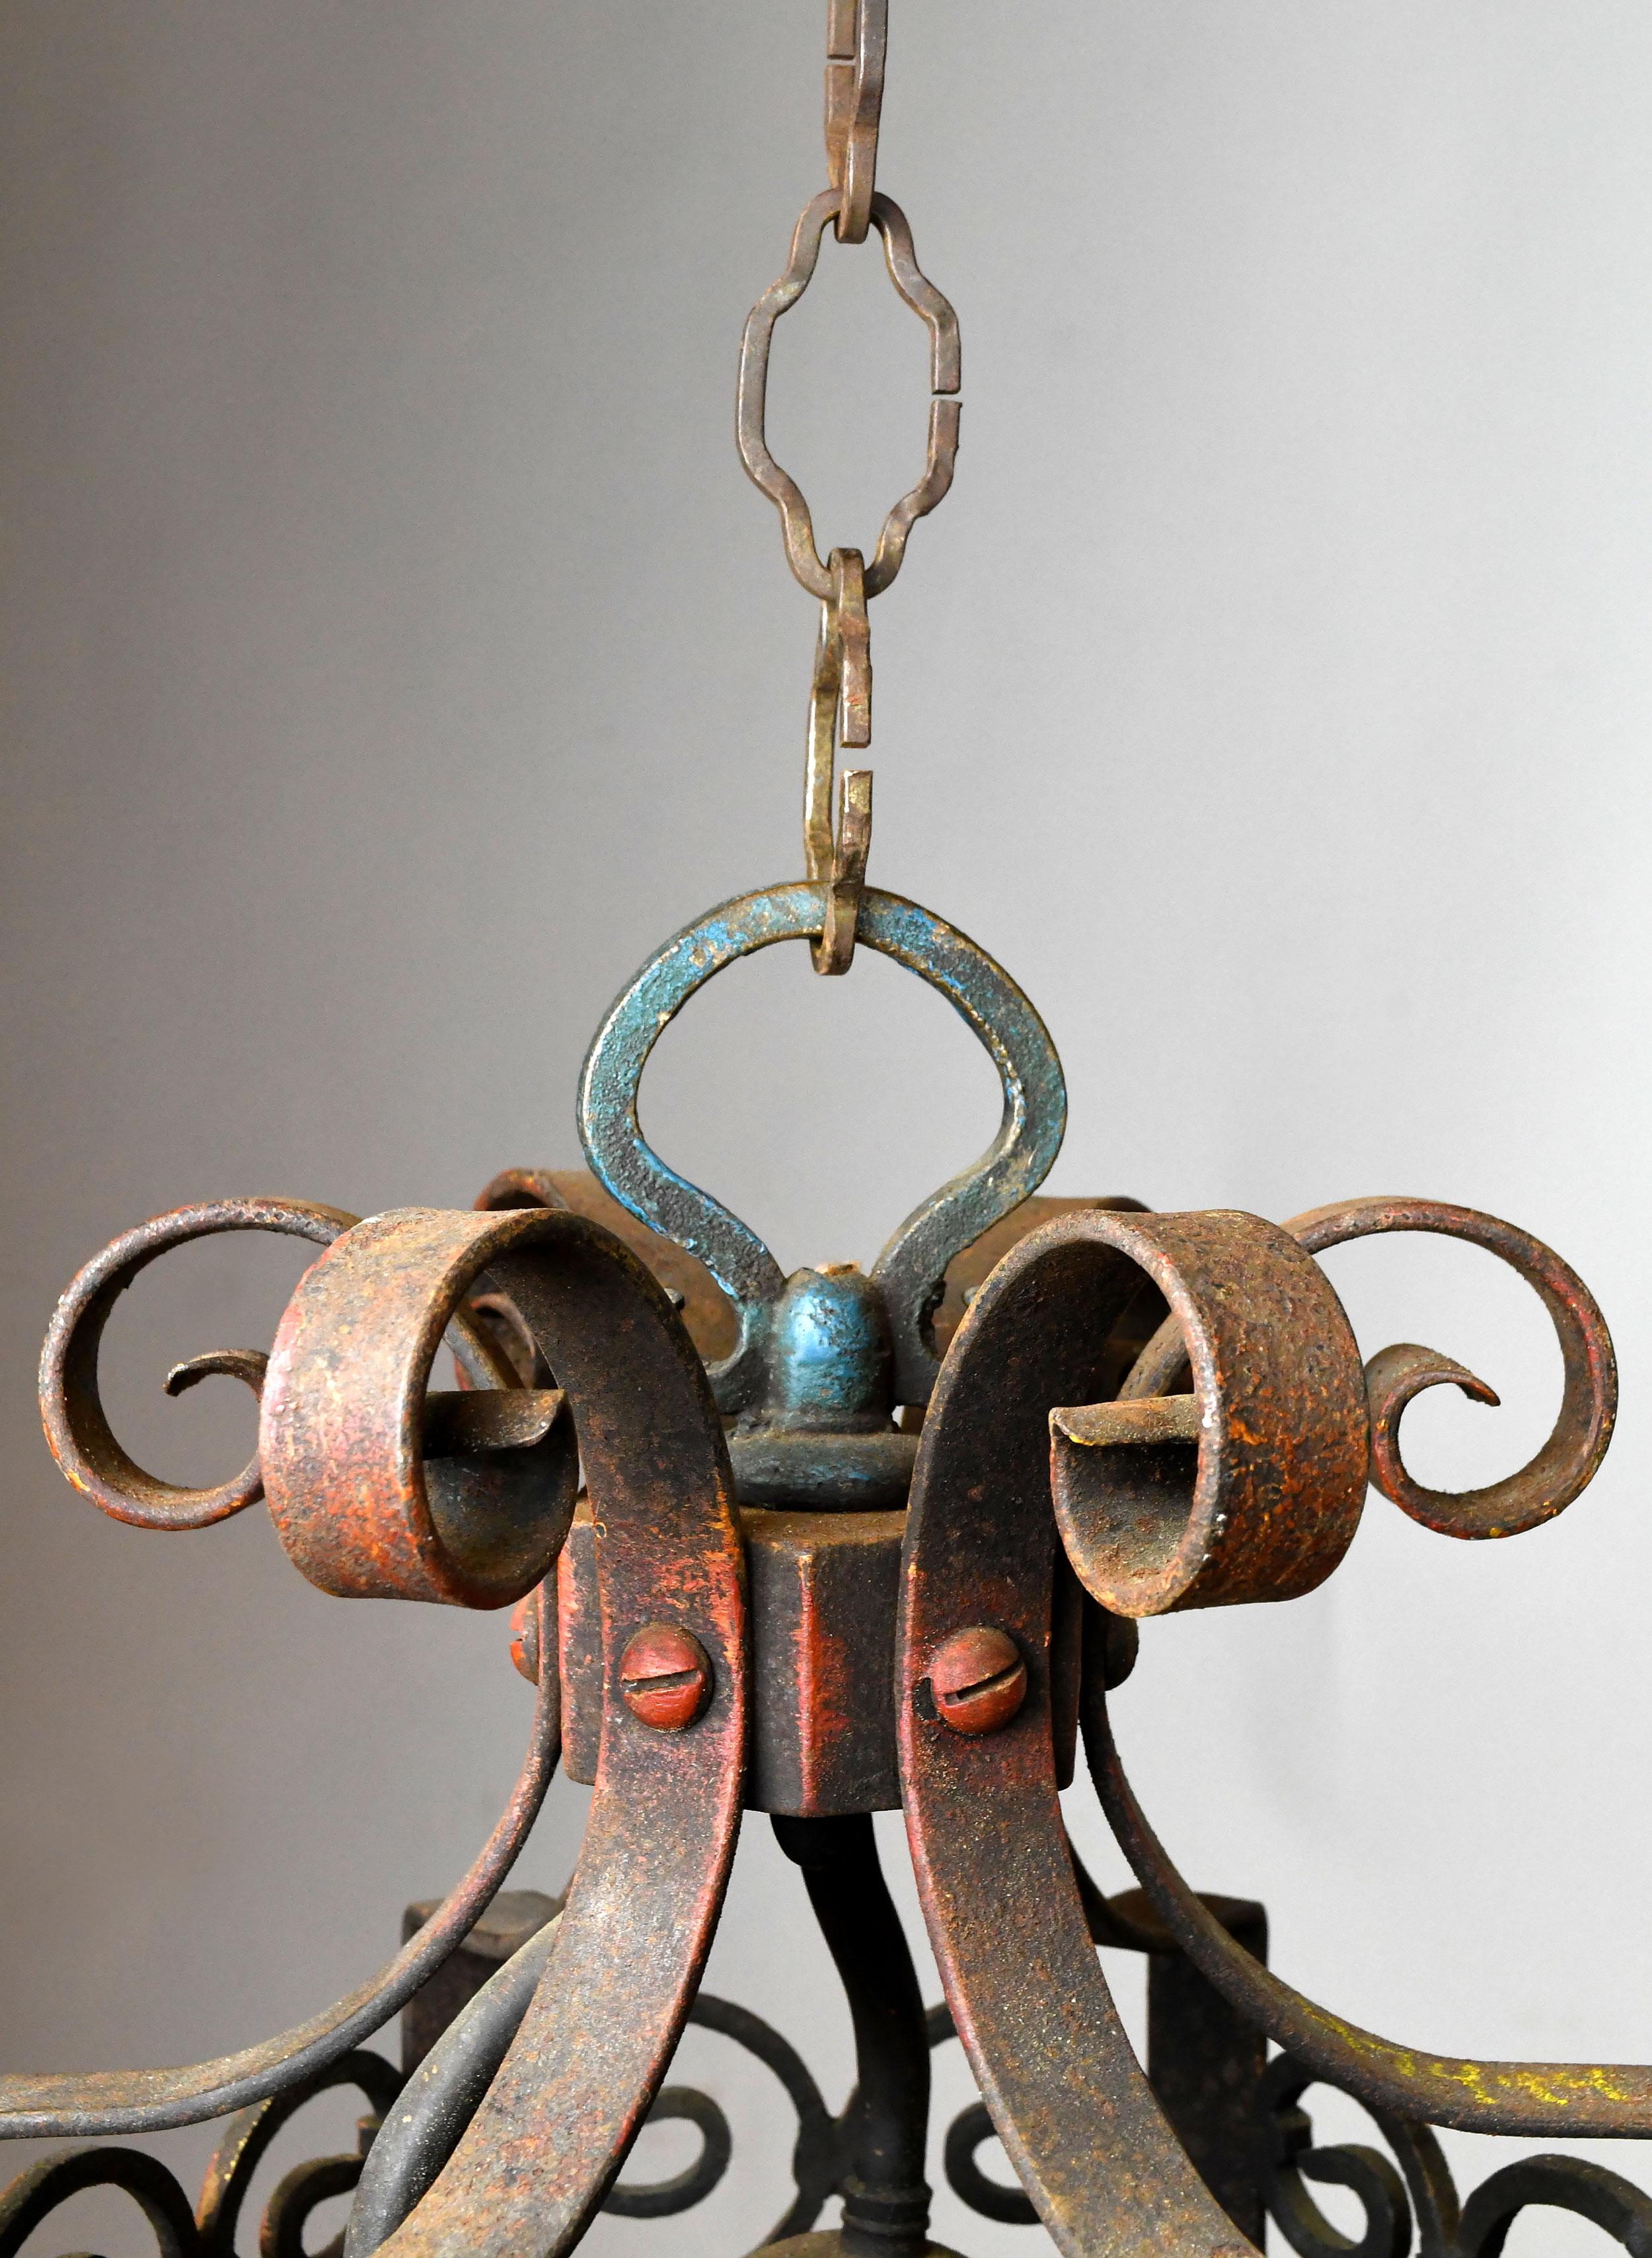 47444-painted-iron-filigree-pendant-chain.jpg